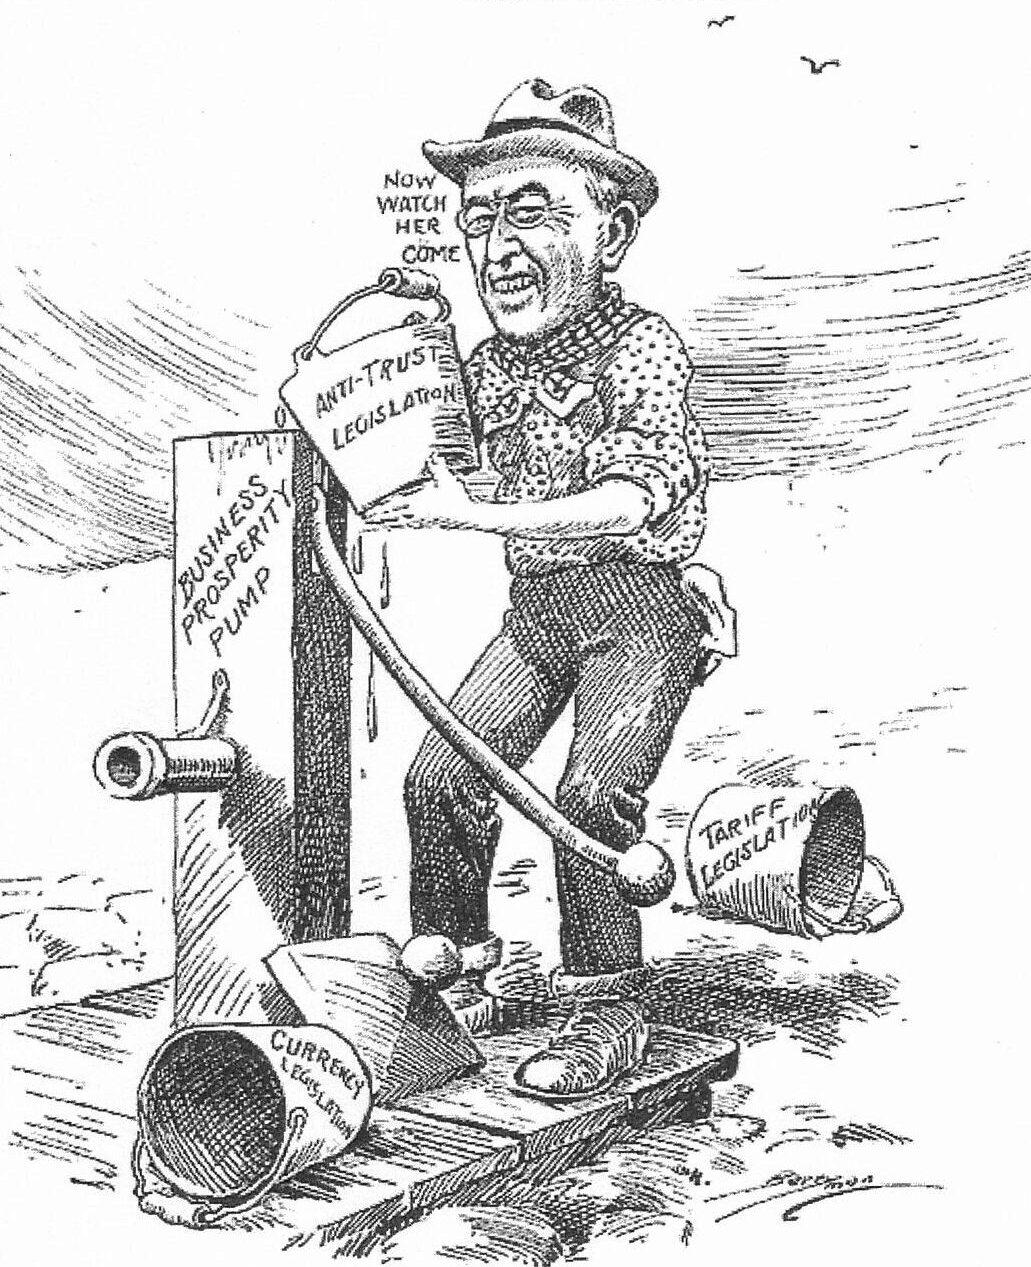 social welfare history project progressive era 1970s Dance 1914 cartoon showing woodrow wilson priming the pump representing prosperity with buckets representing legislation photo national archives